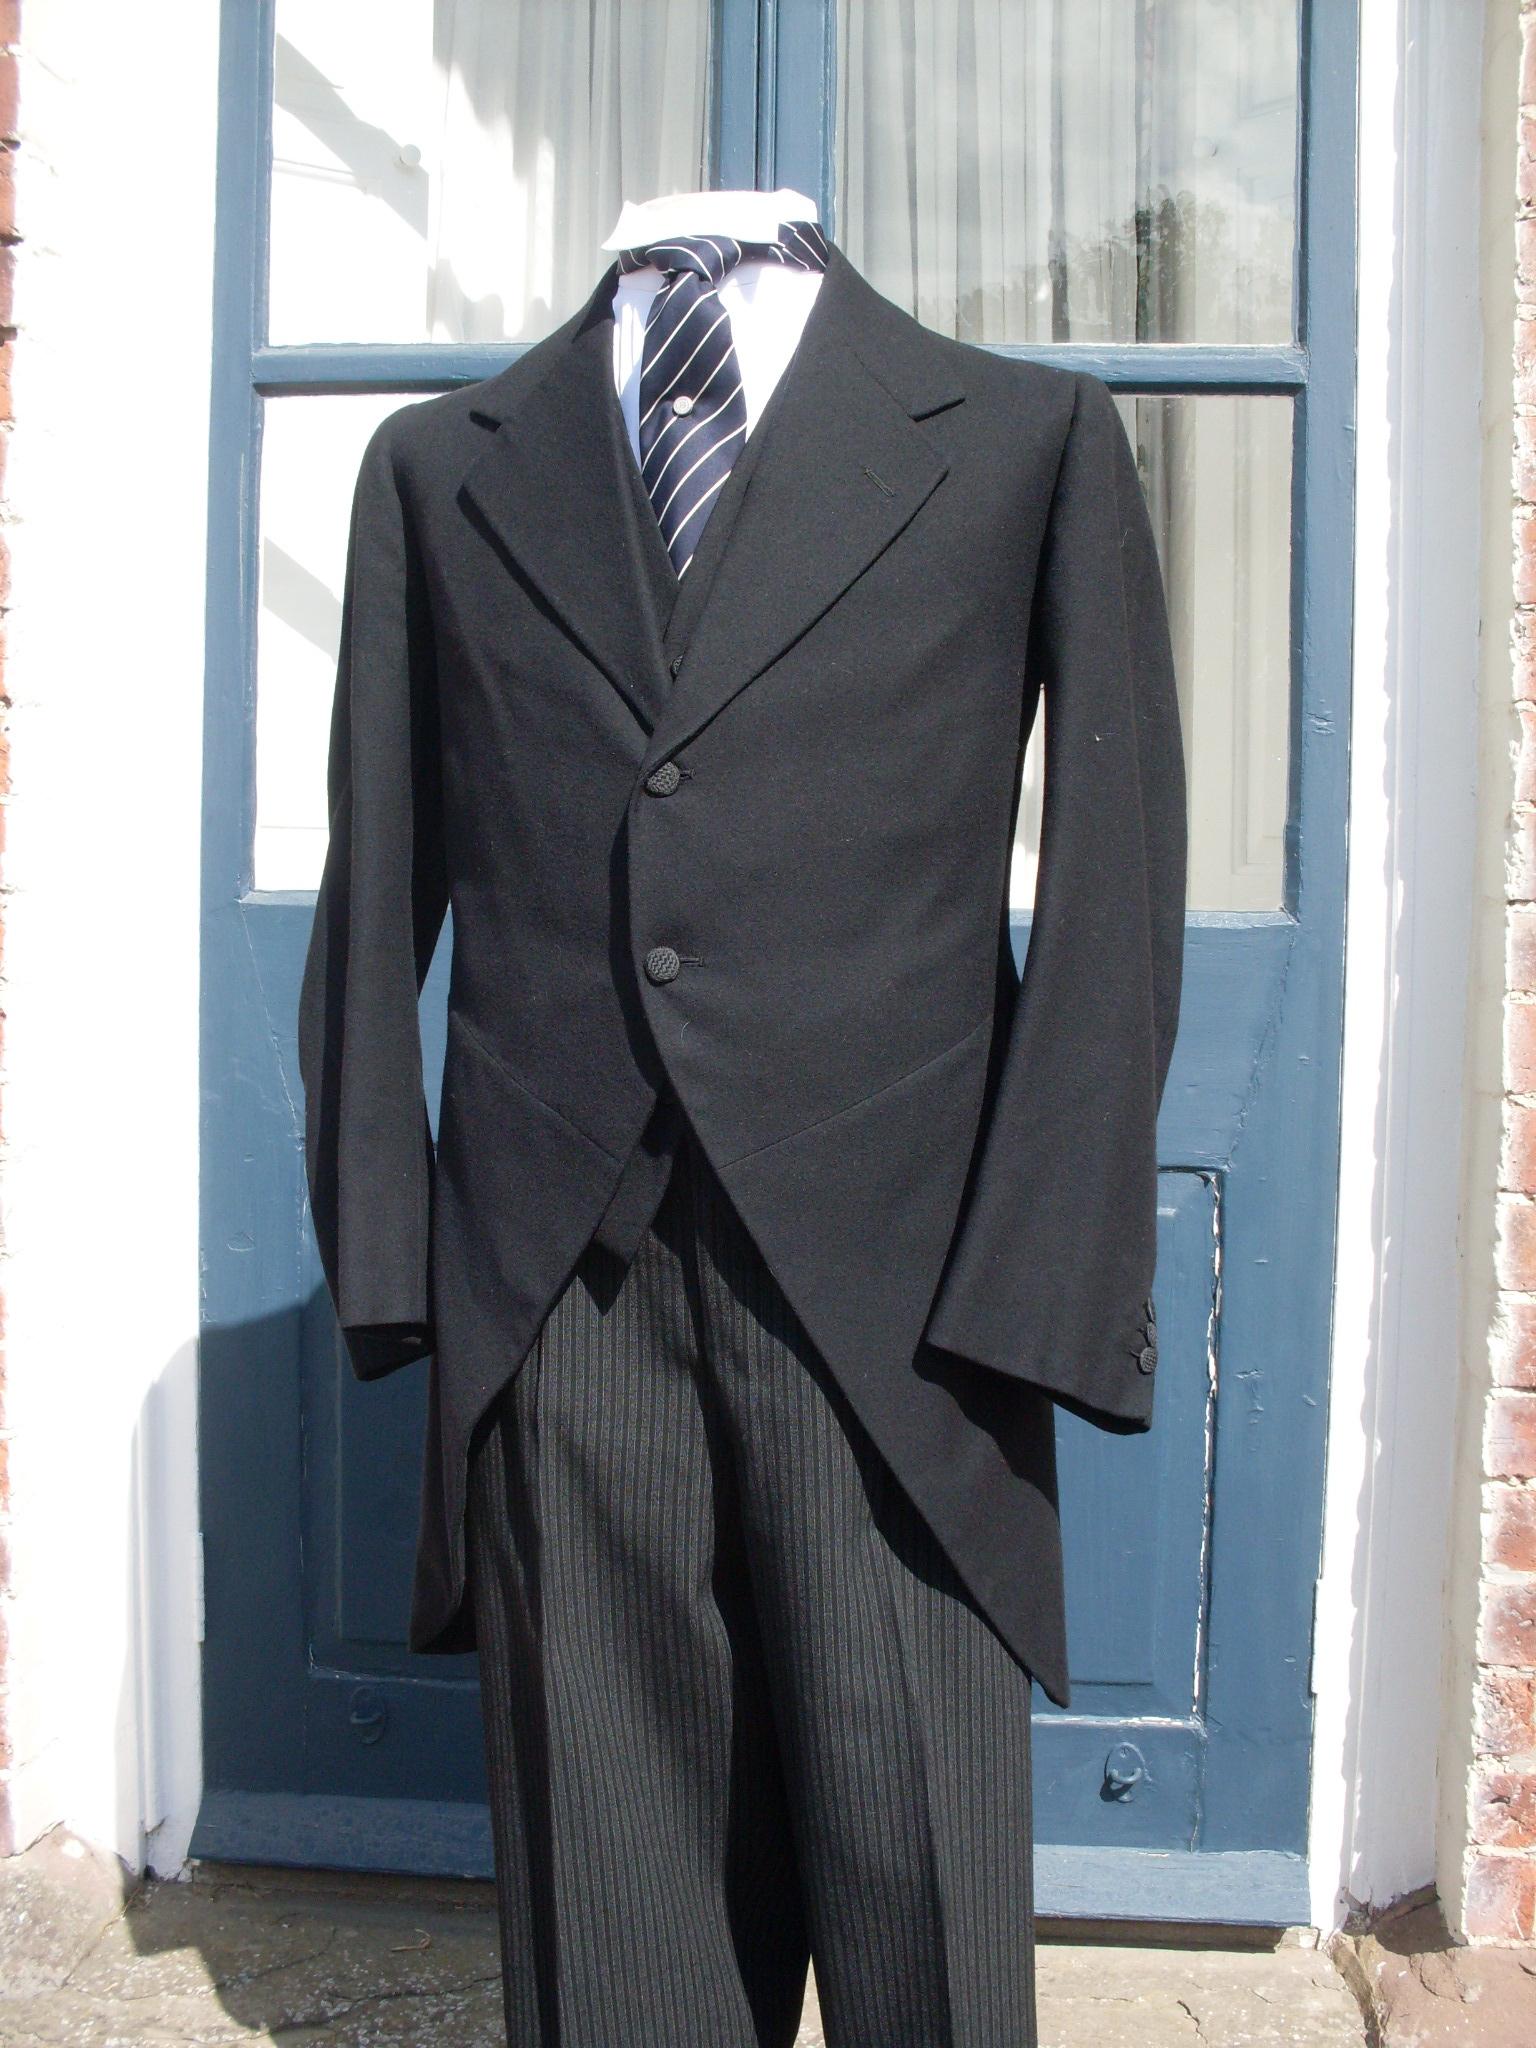 f60cfca9c Morning Coats | Andrews & Pygott: The Morning Dress Guide